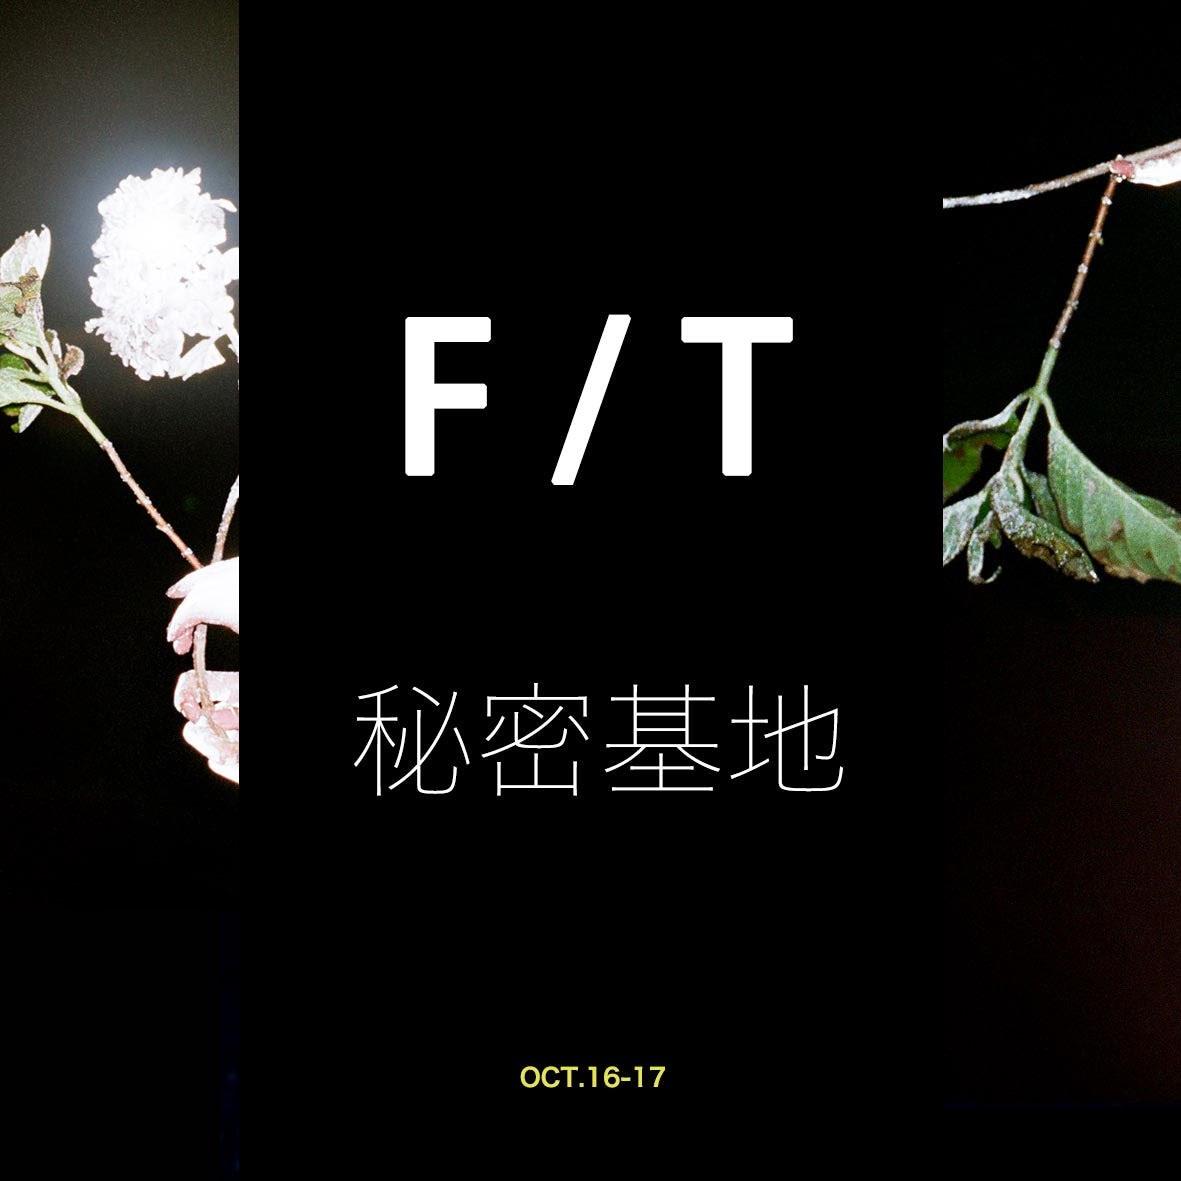 「F T 秘密基地」ビジュアル